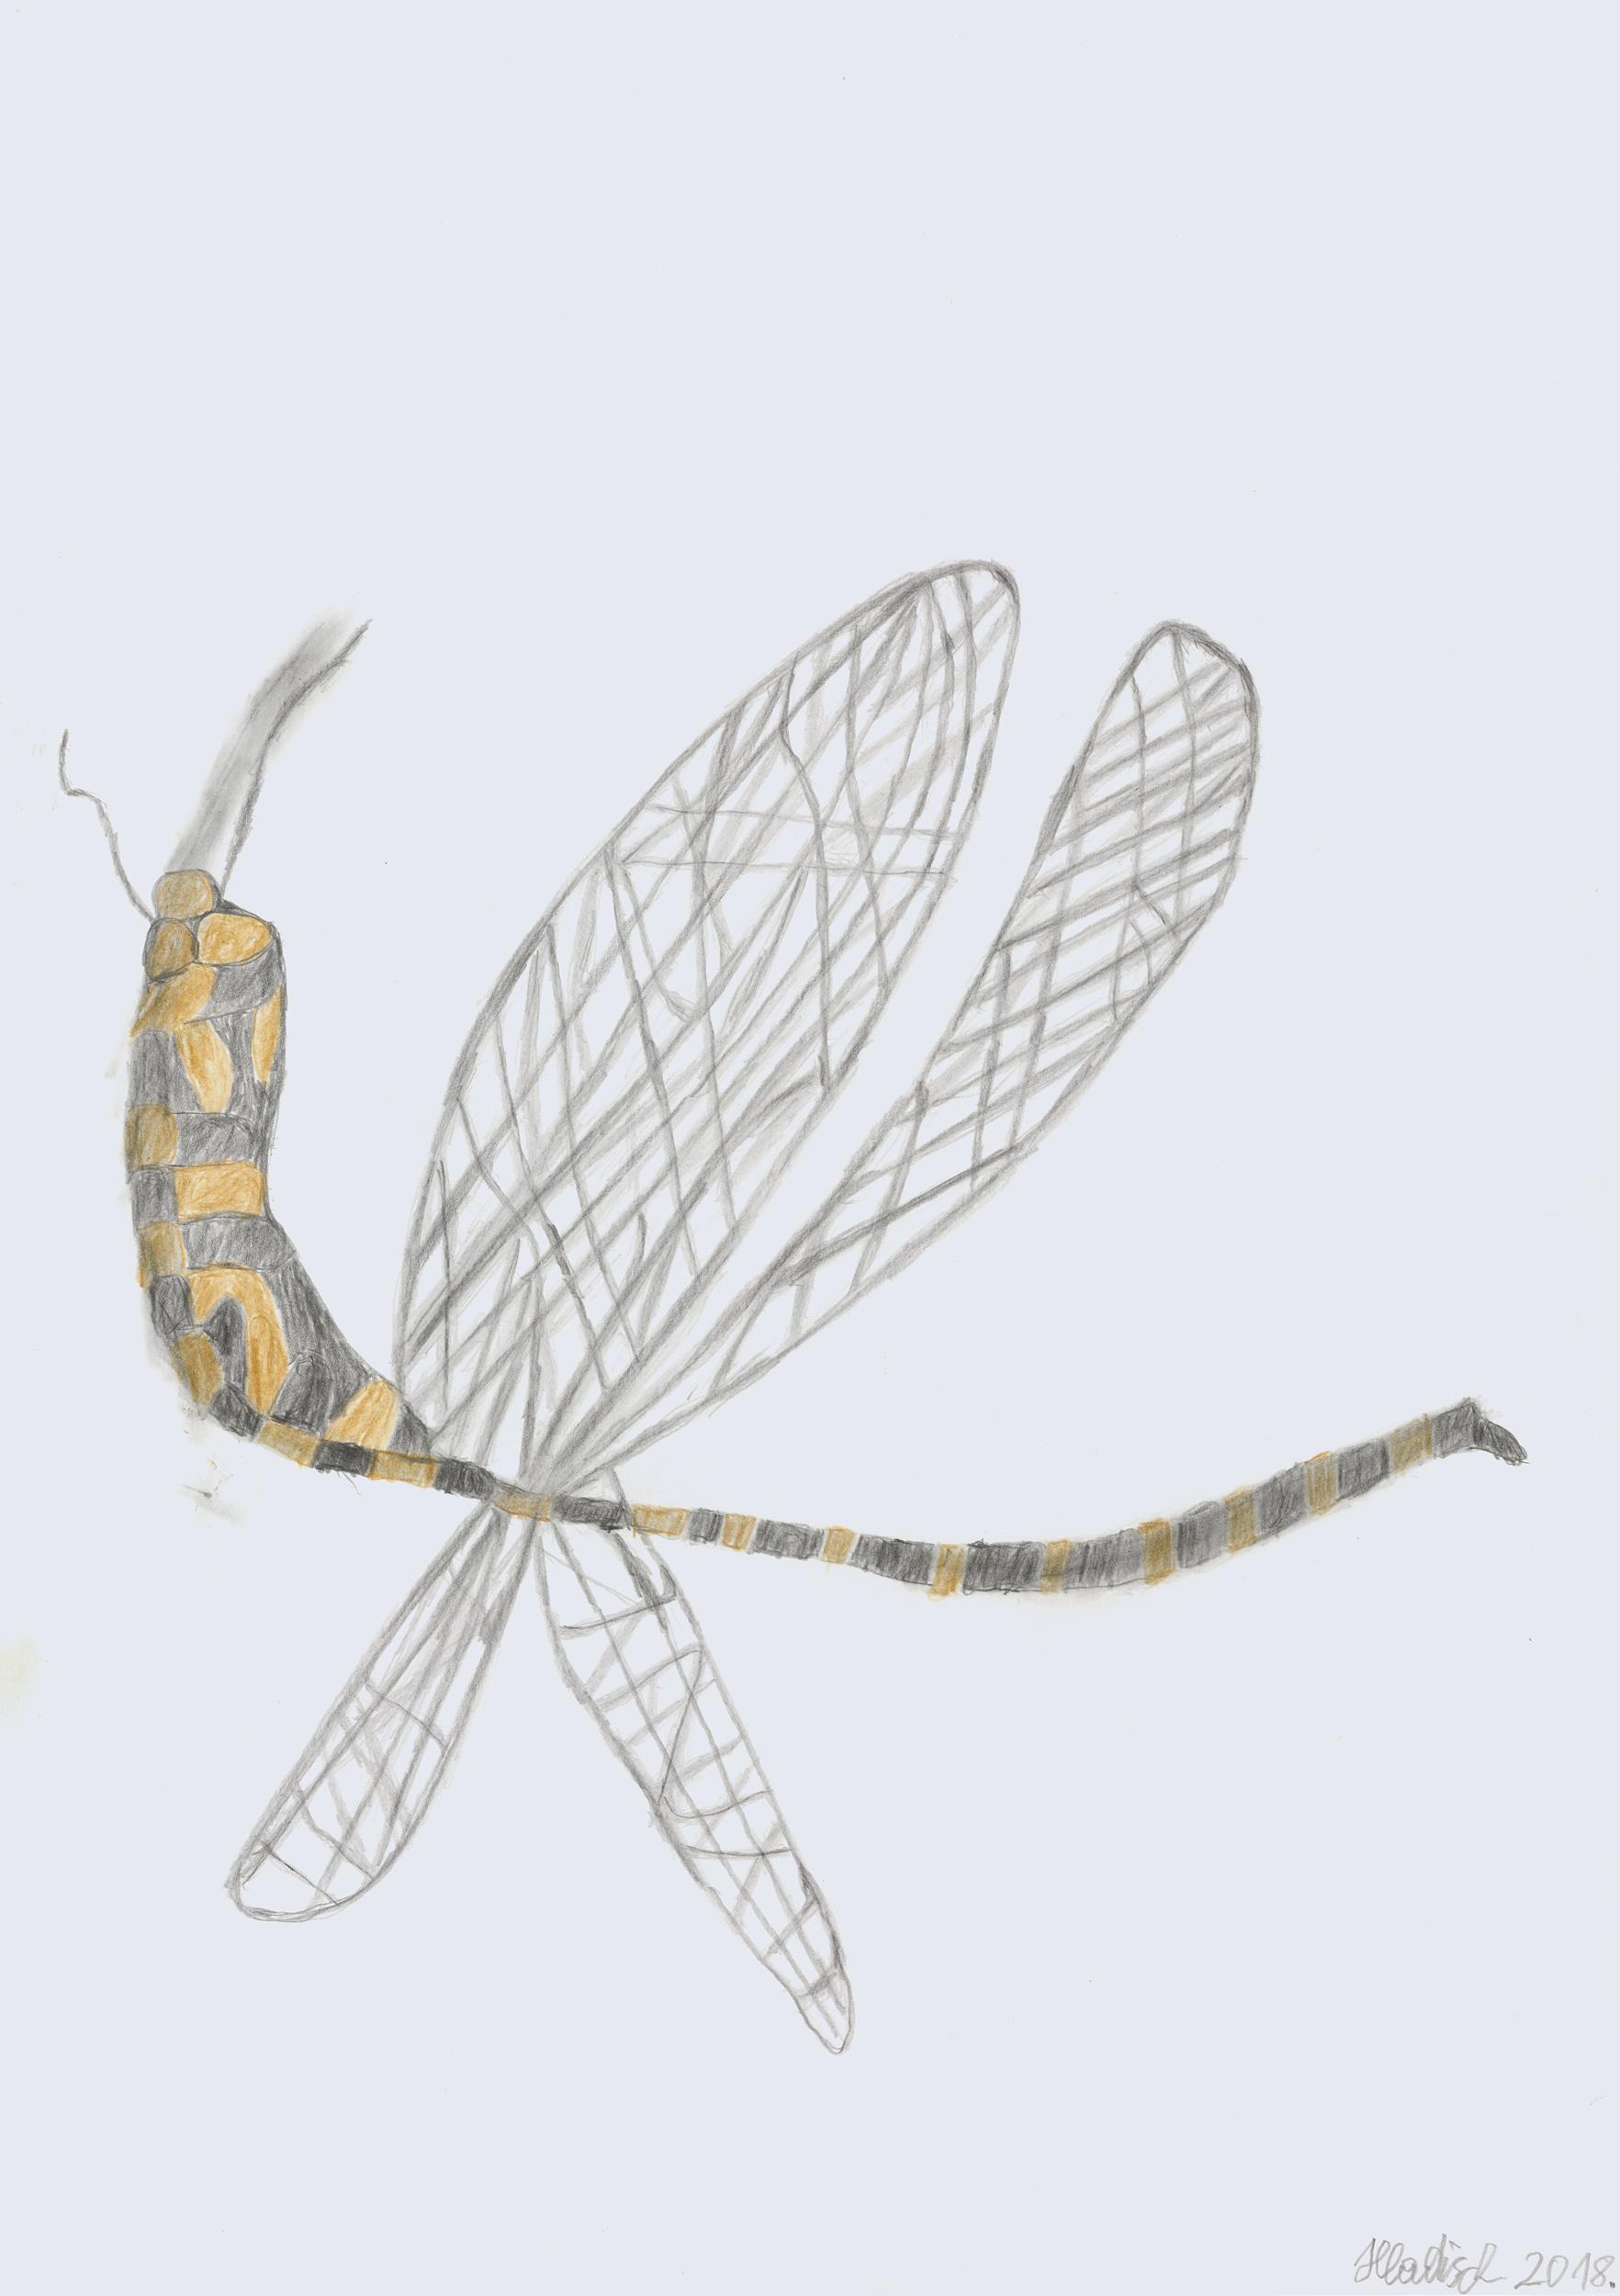 hladisch helmut - Lybelle / Dragon fly